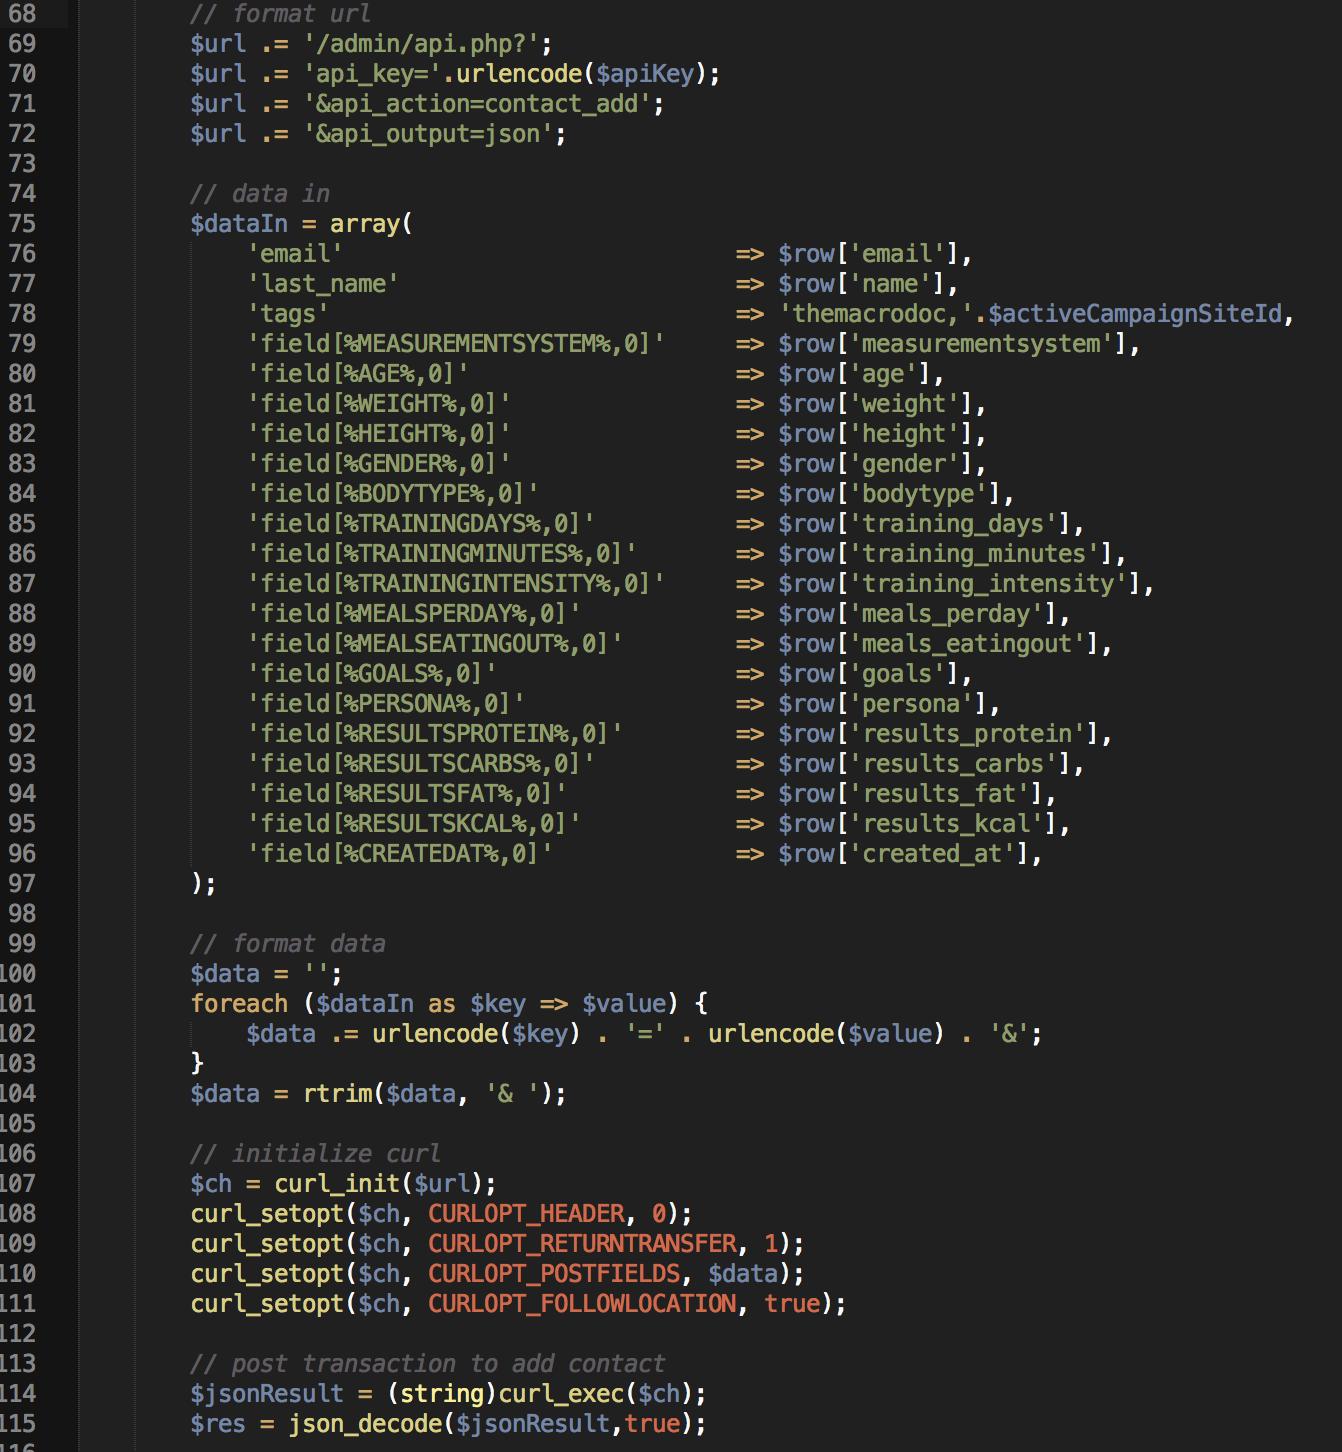 Adding custom fields via API, value always empty - Developers